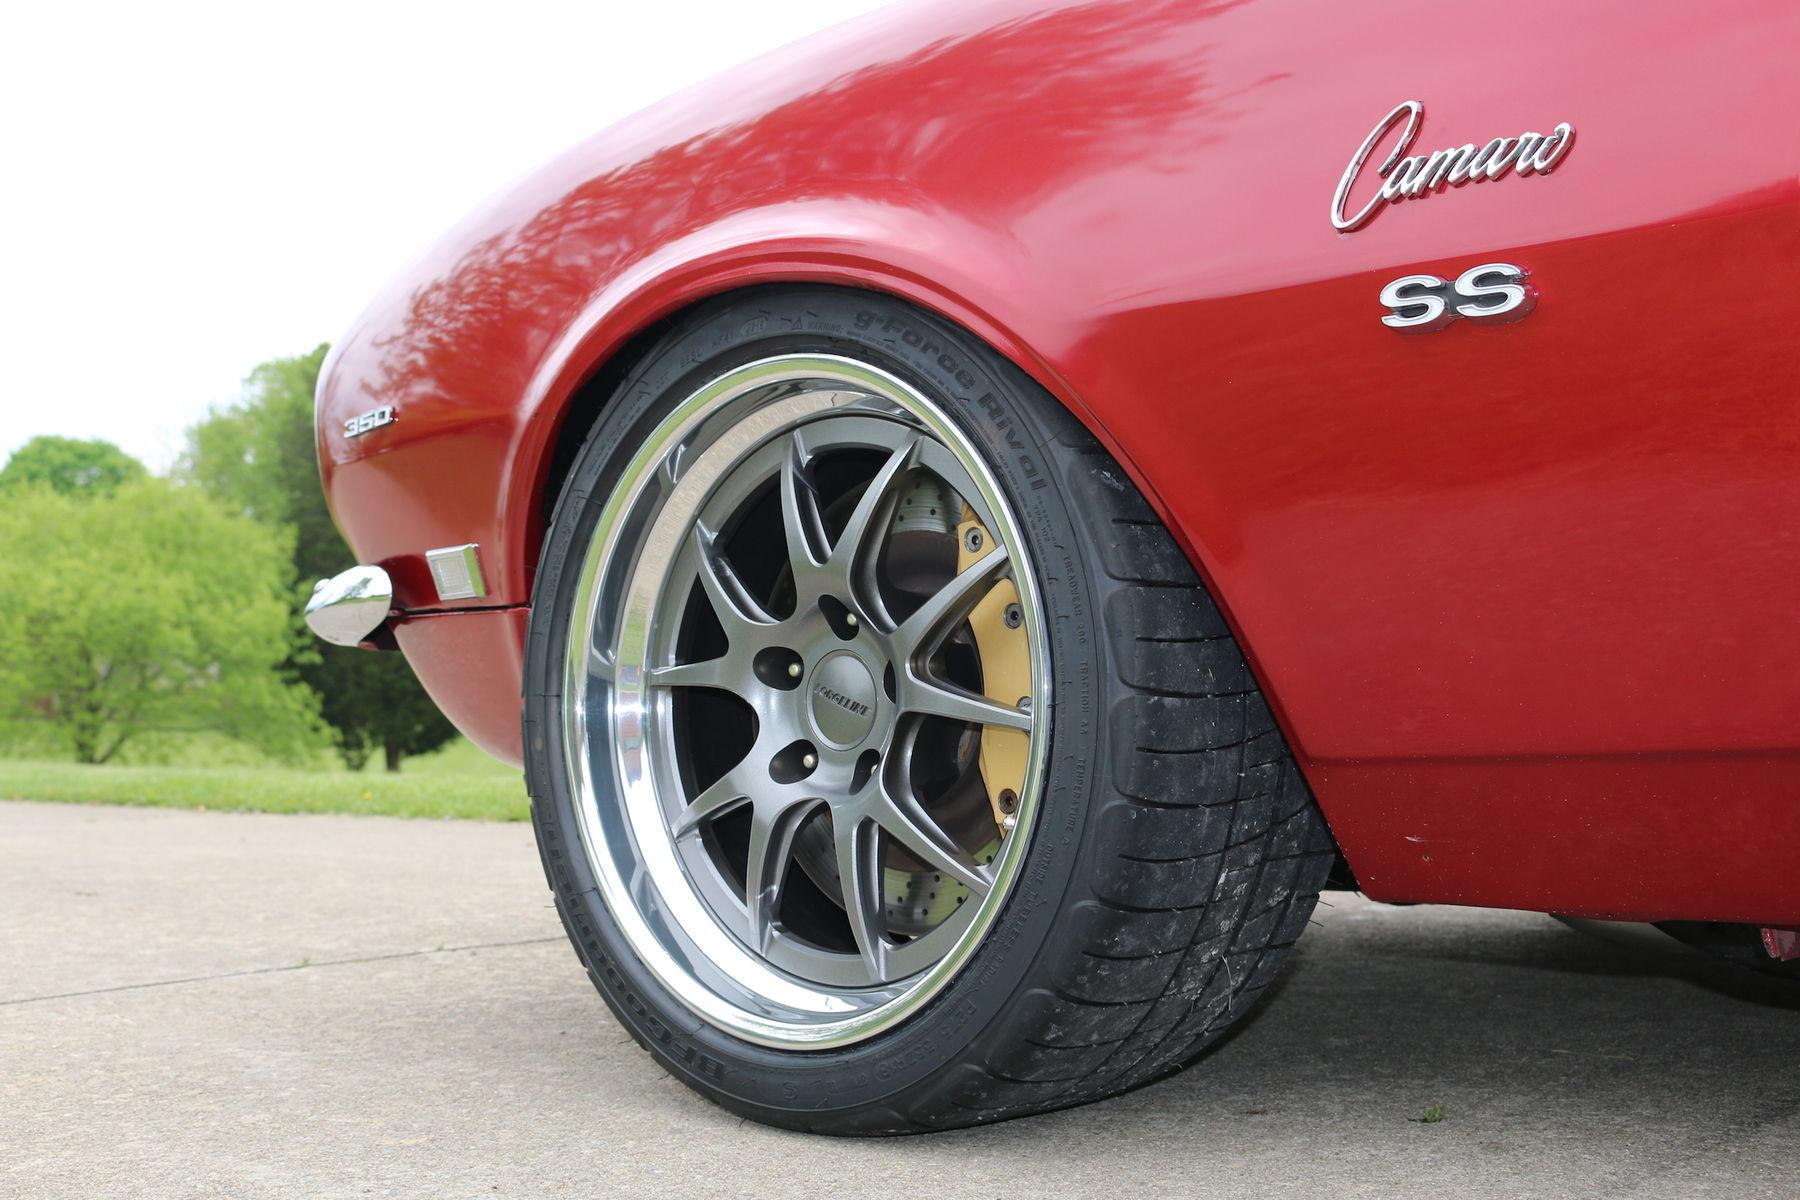 1968 Chevrolet Camaro | Nathan Johnson's Incredible 1968 Camaro on Forgeline GA3 Wheels